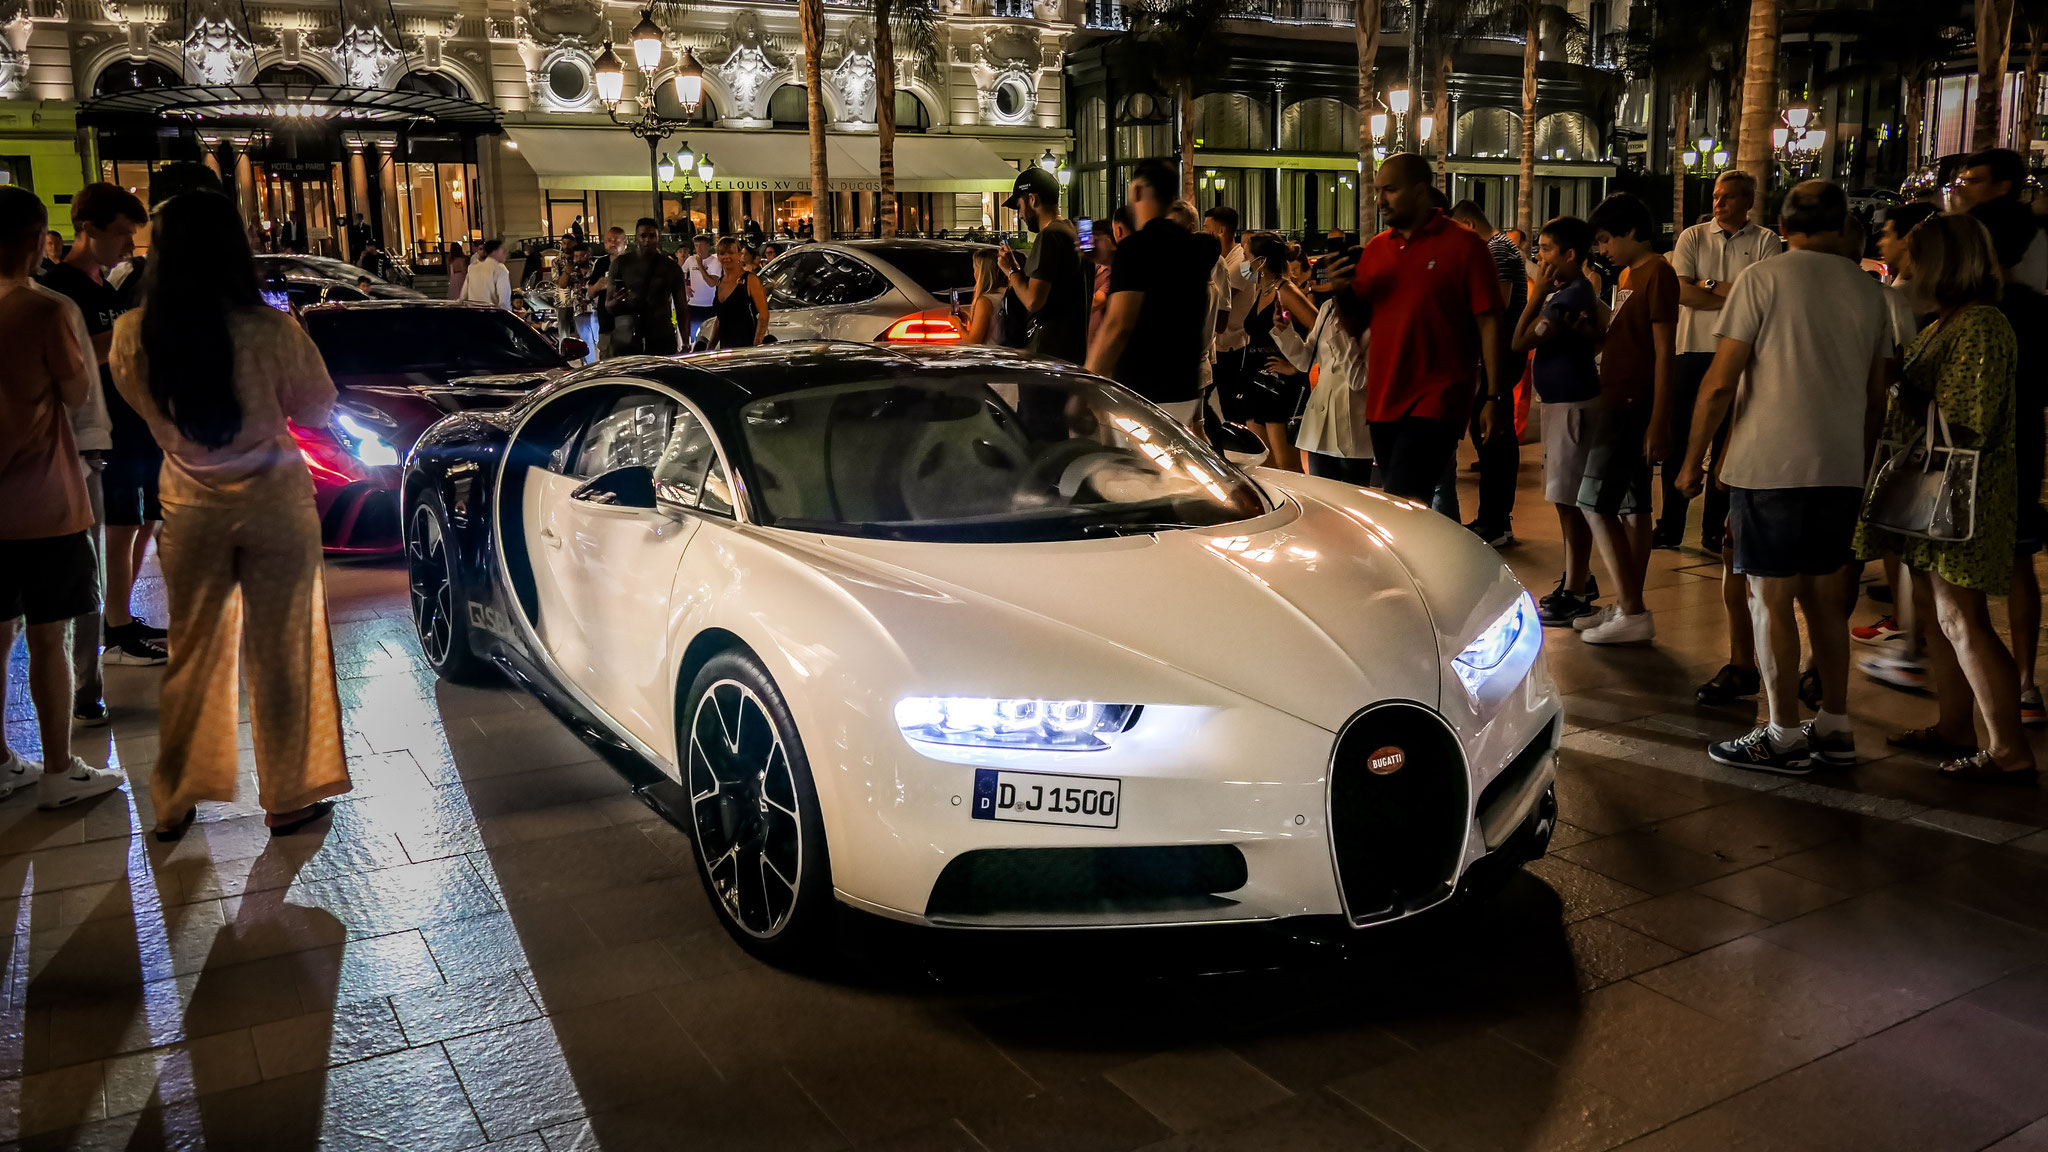 Bugatti Chiron - D-J-1500